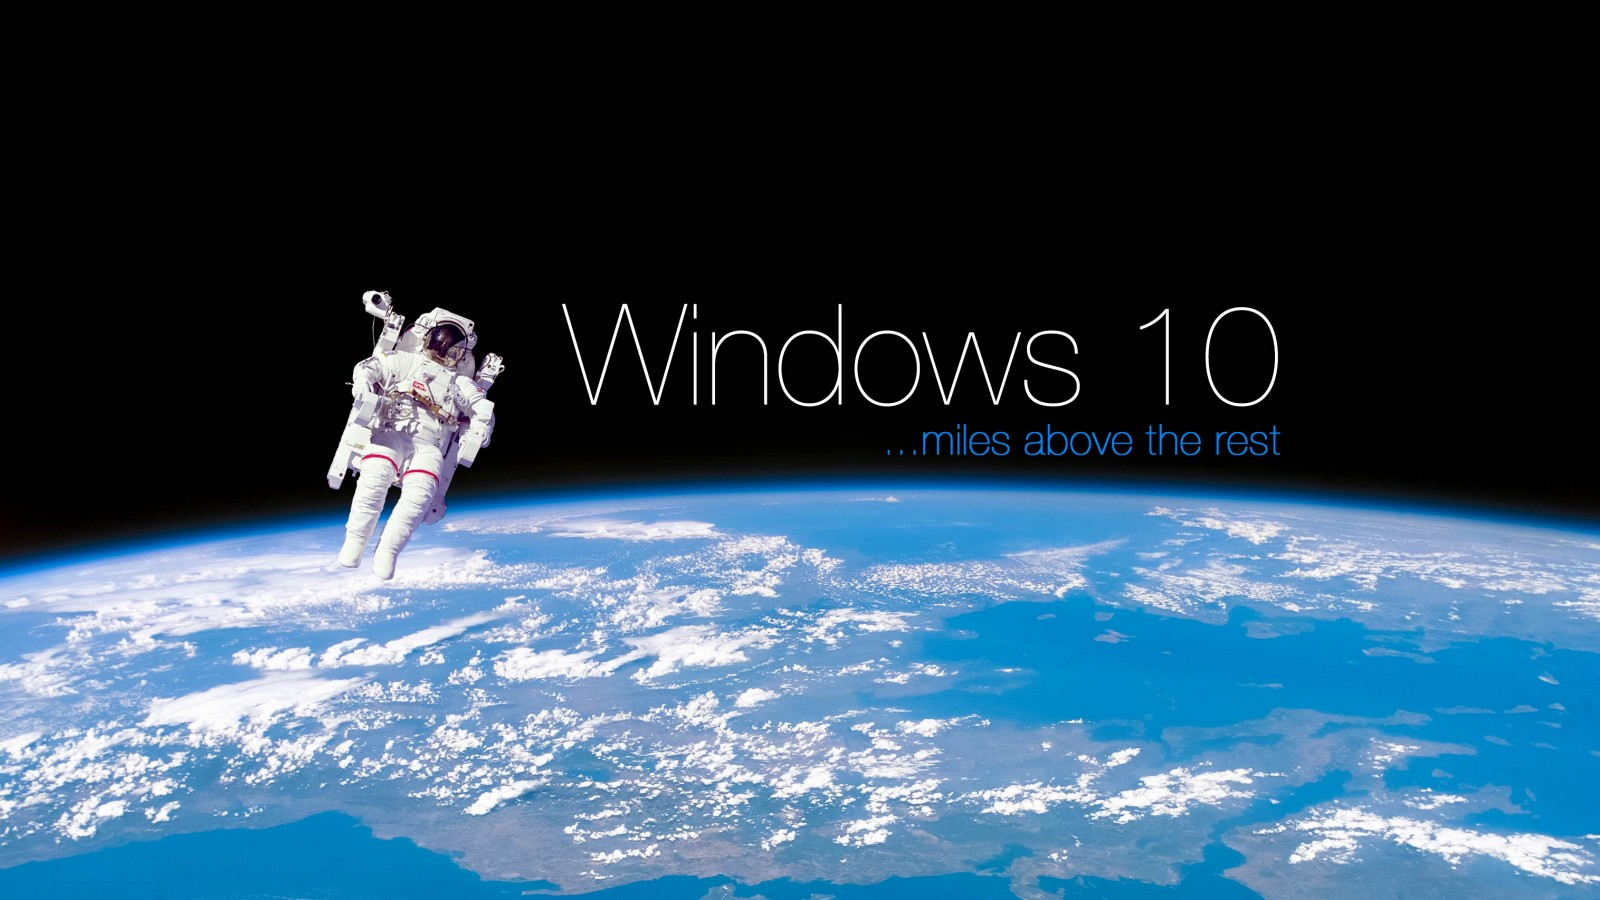 Windows 10 space 4k wallpaper 1600x900   Wallpaper   Wallpaper Style 1600x900